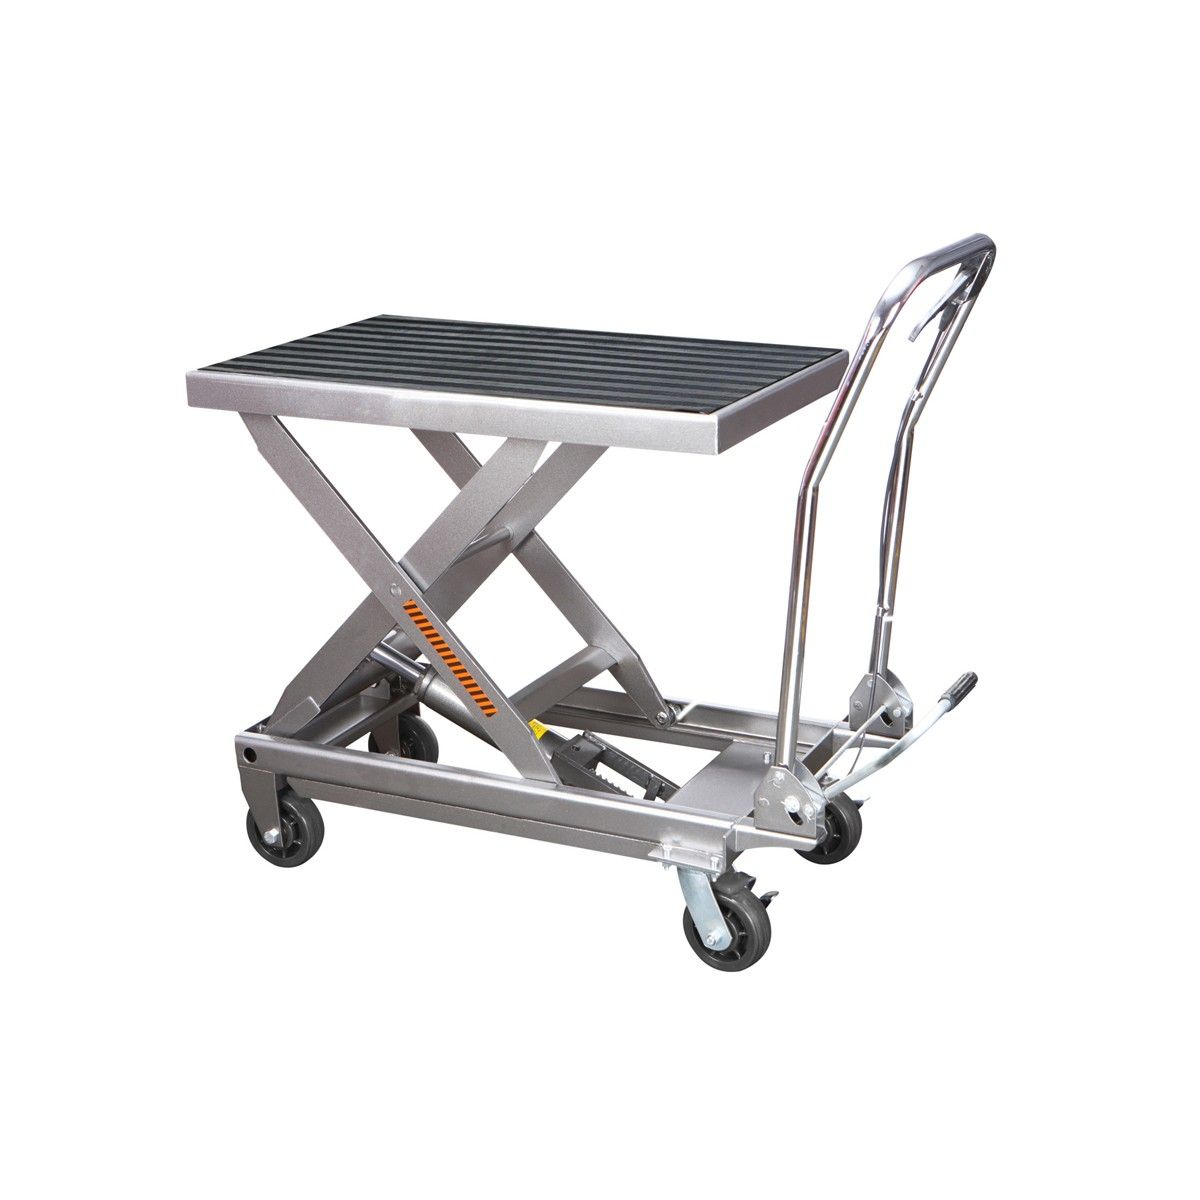 Roughneck Rapid Lift XT Lift Table 500lb Capacity